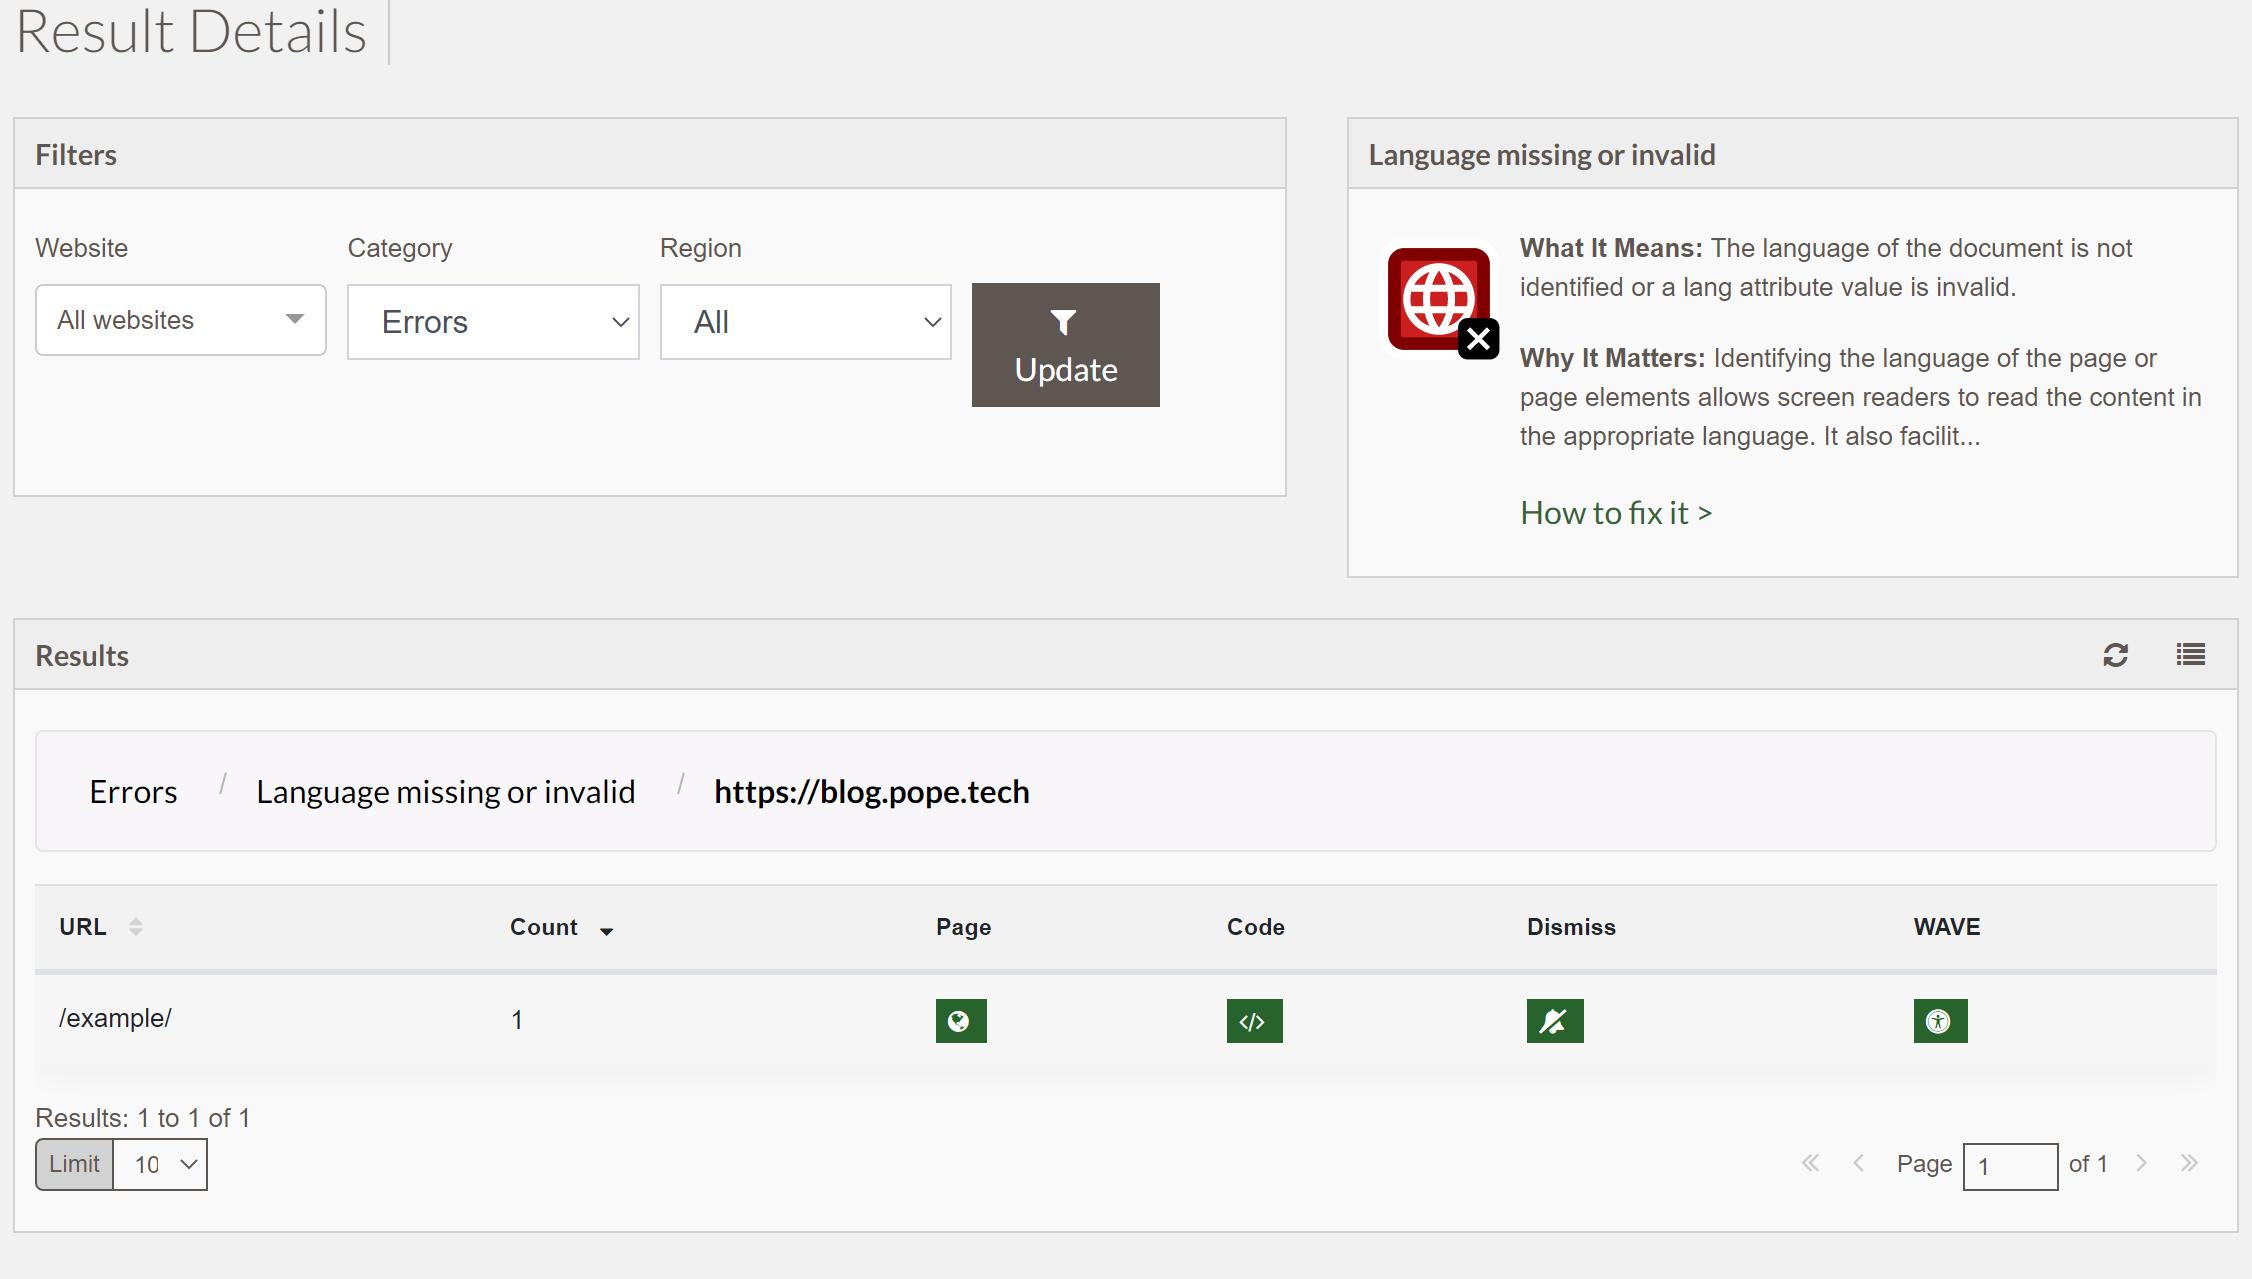 screenshot of result details view including documentation of result